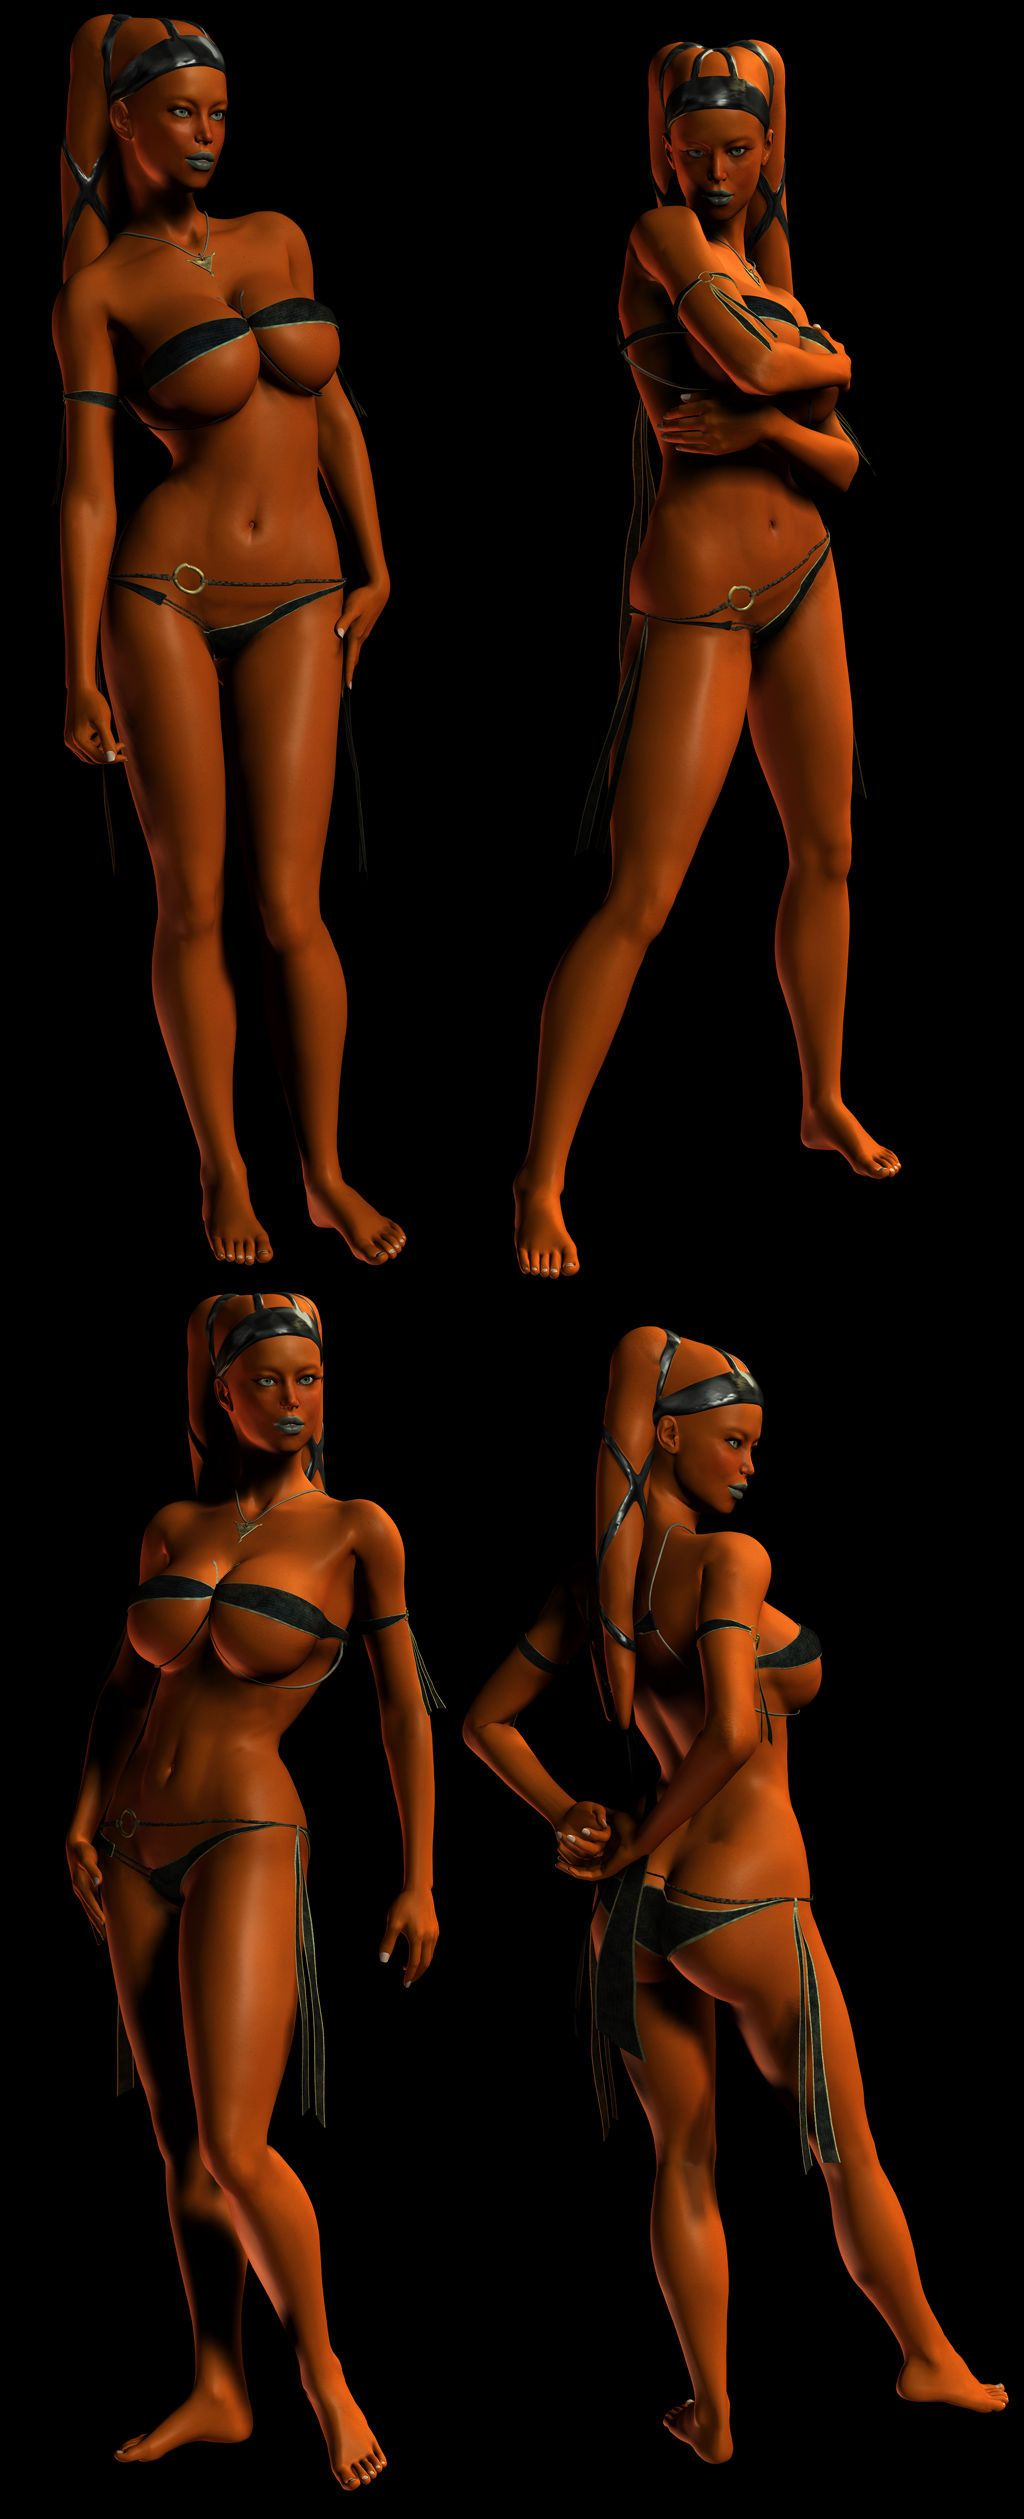 3D Twilek babes - part 4